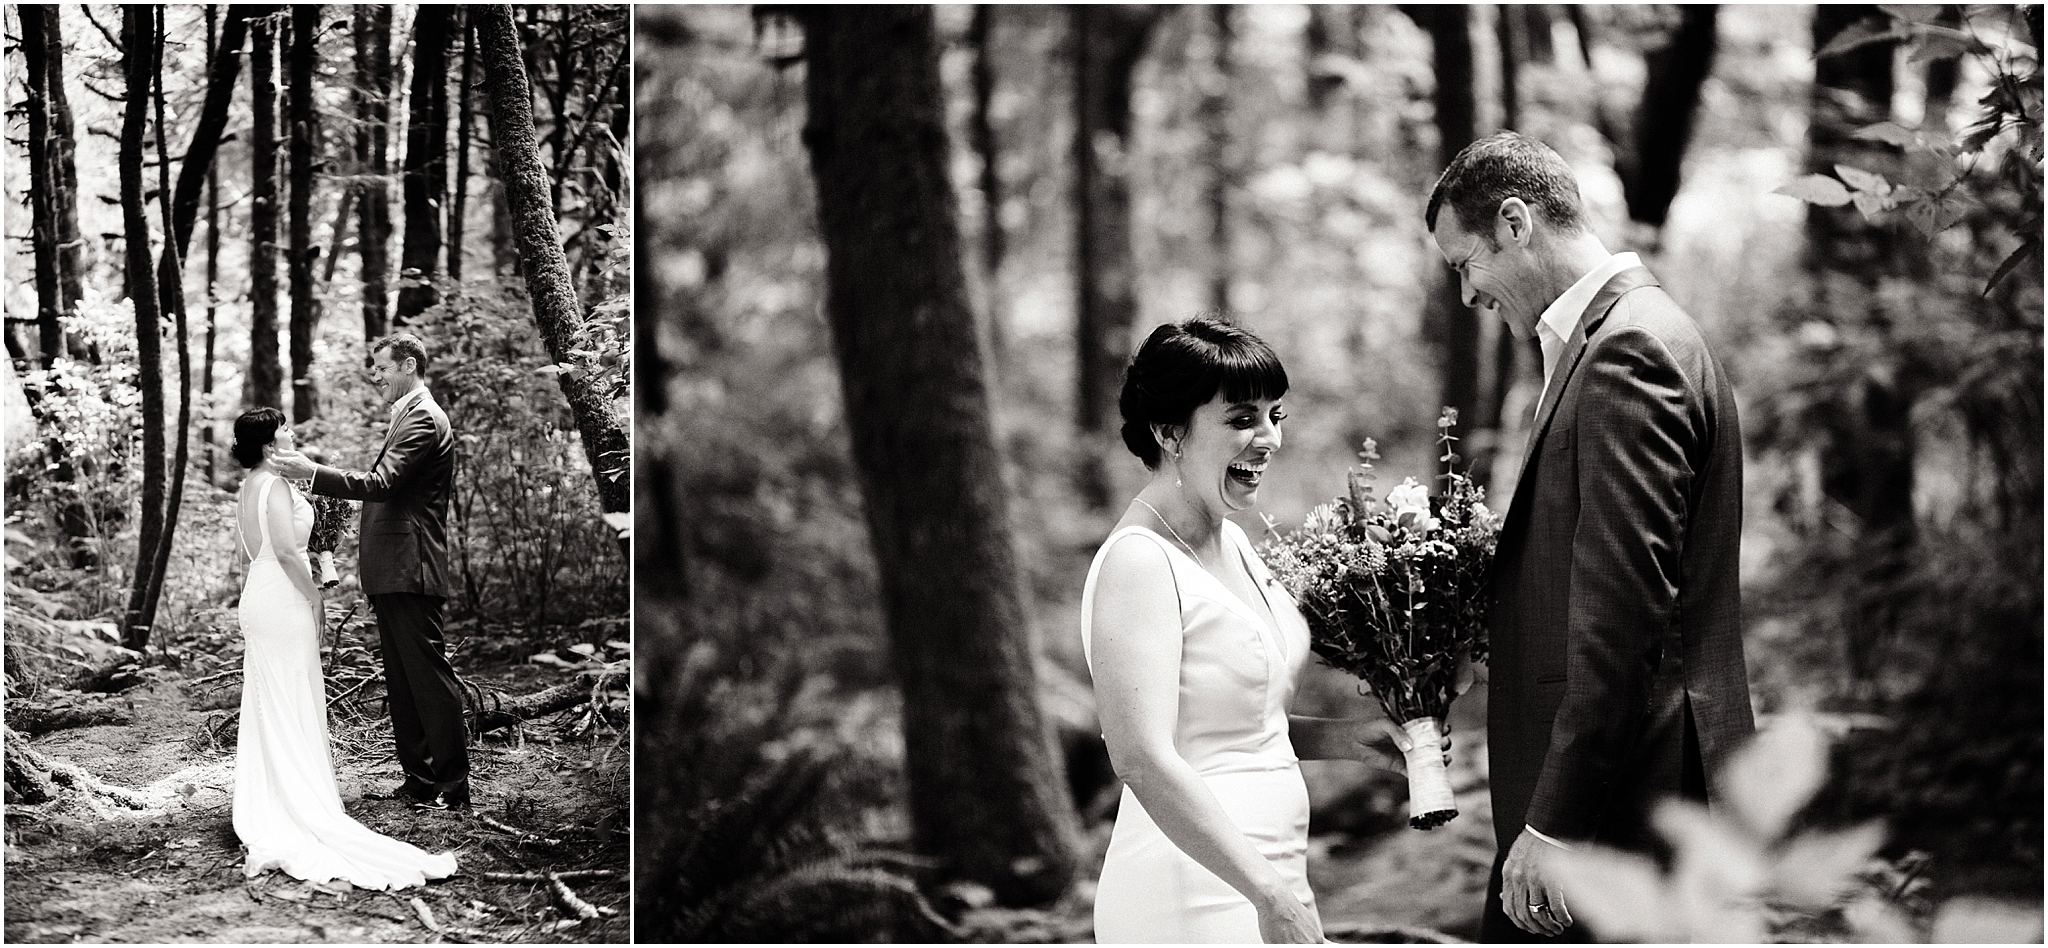 Oregon Coast Intimate Wedding | oregon elopement photographer | oregon elopement5.jpg